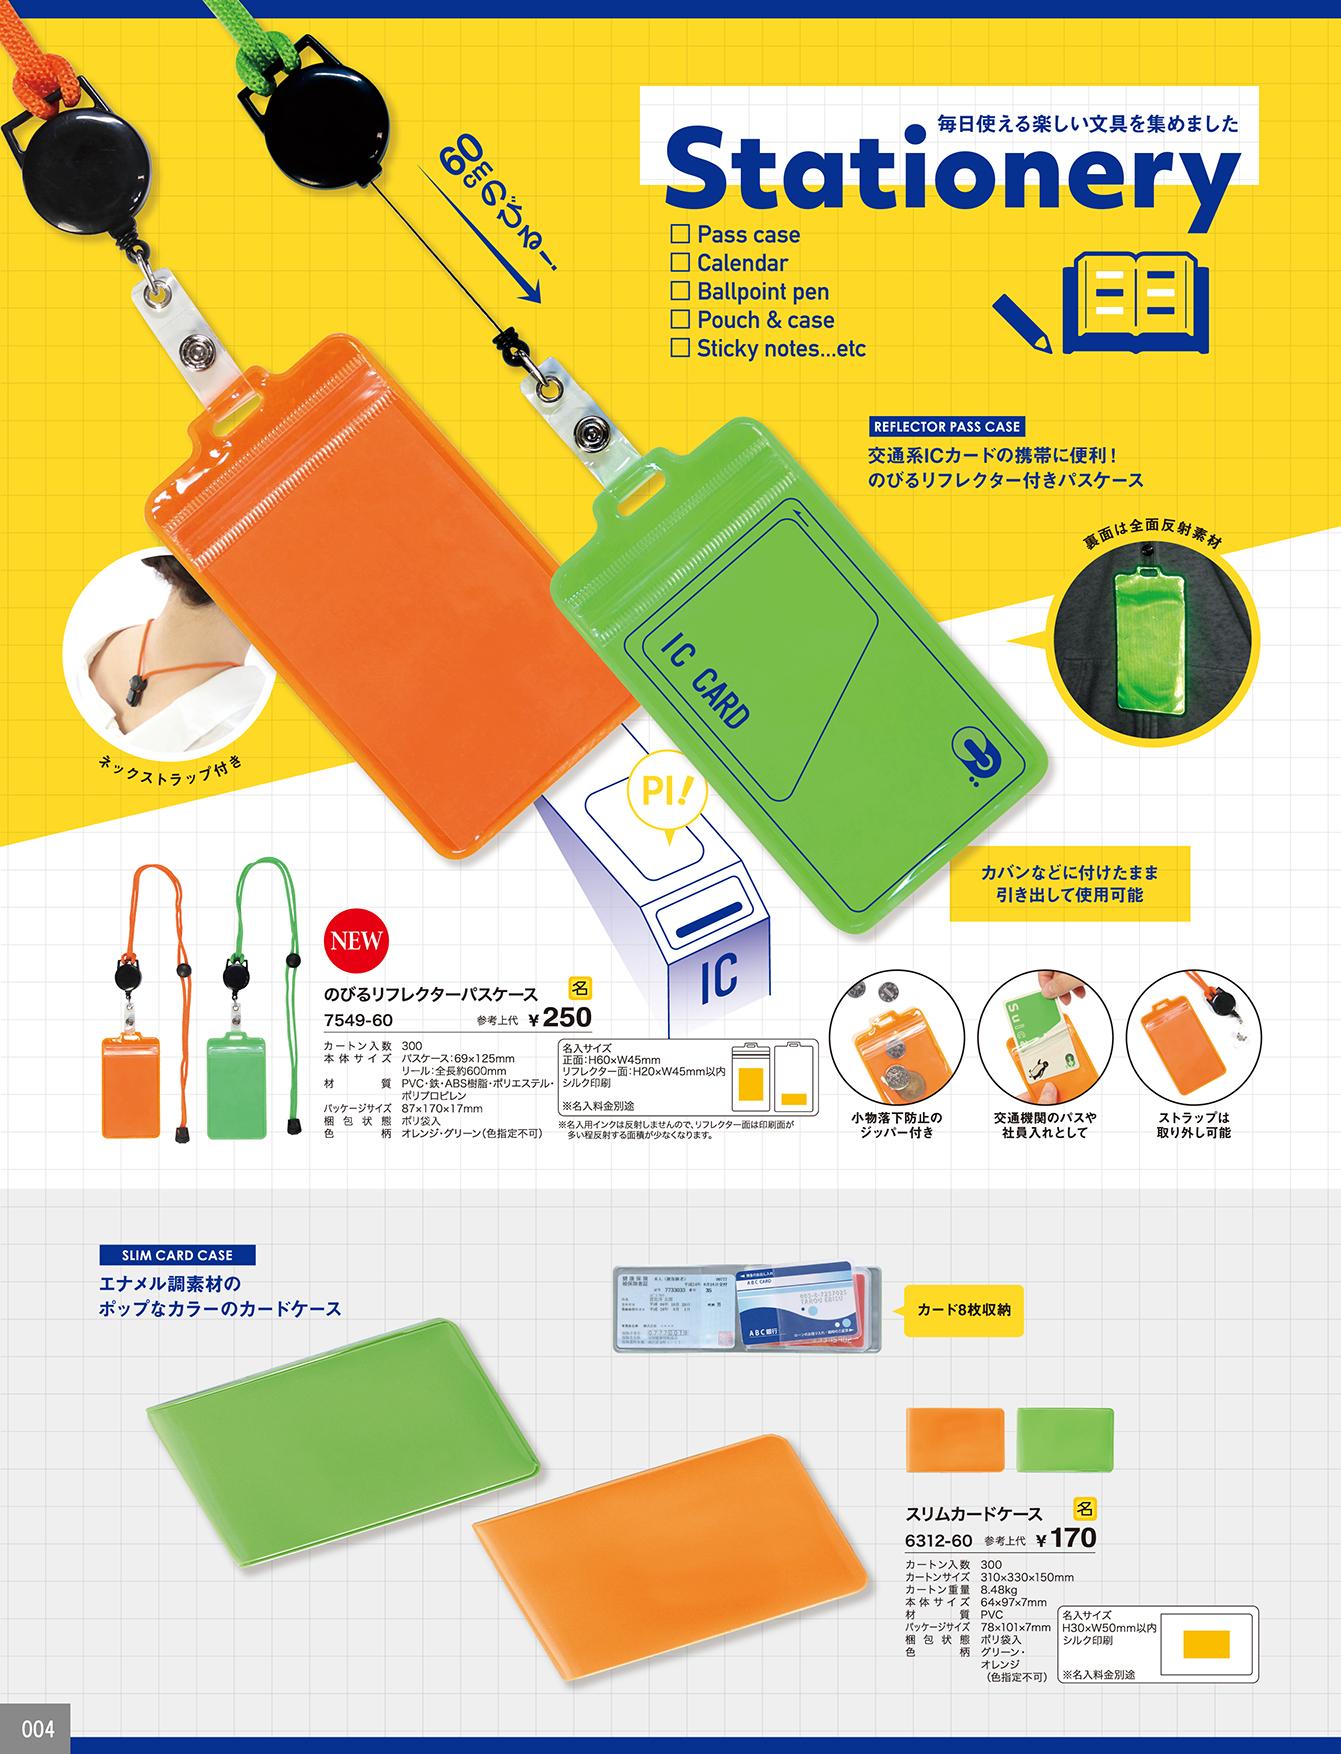 event tools kit